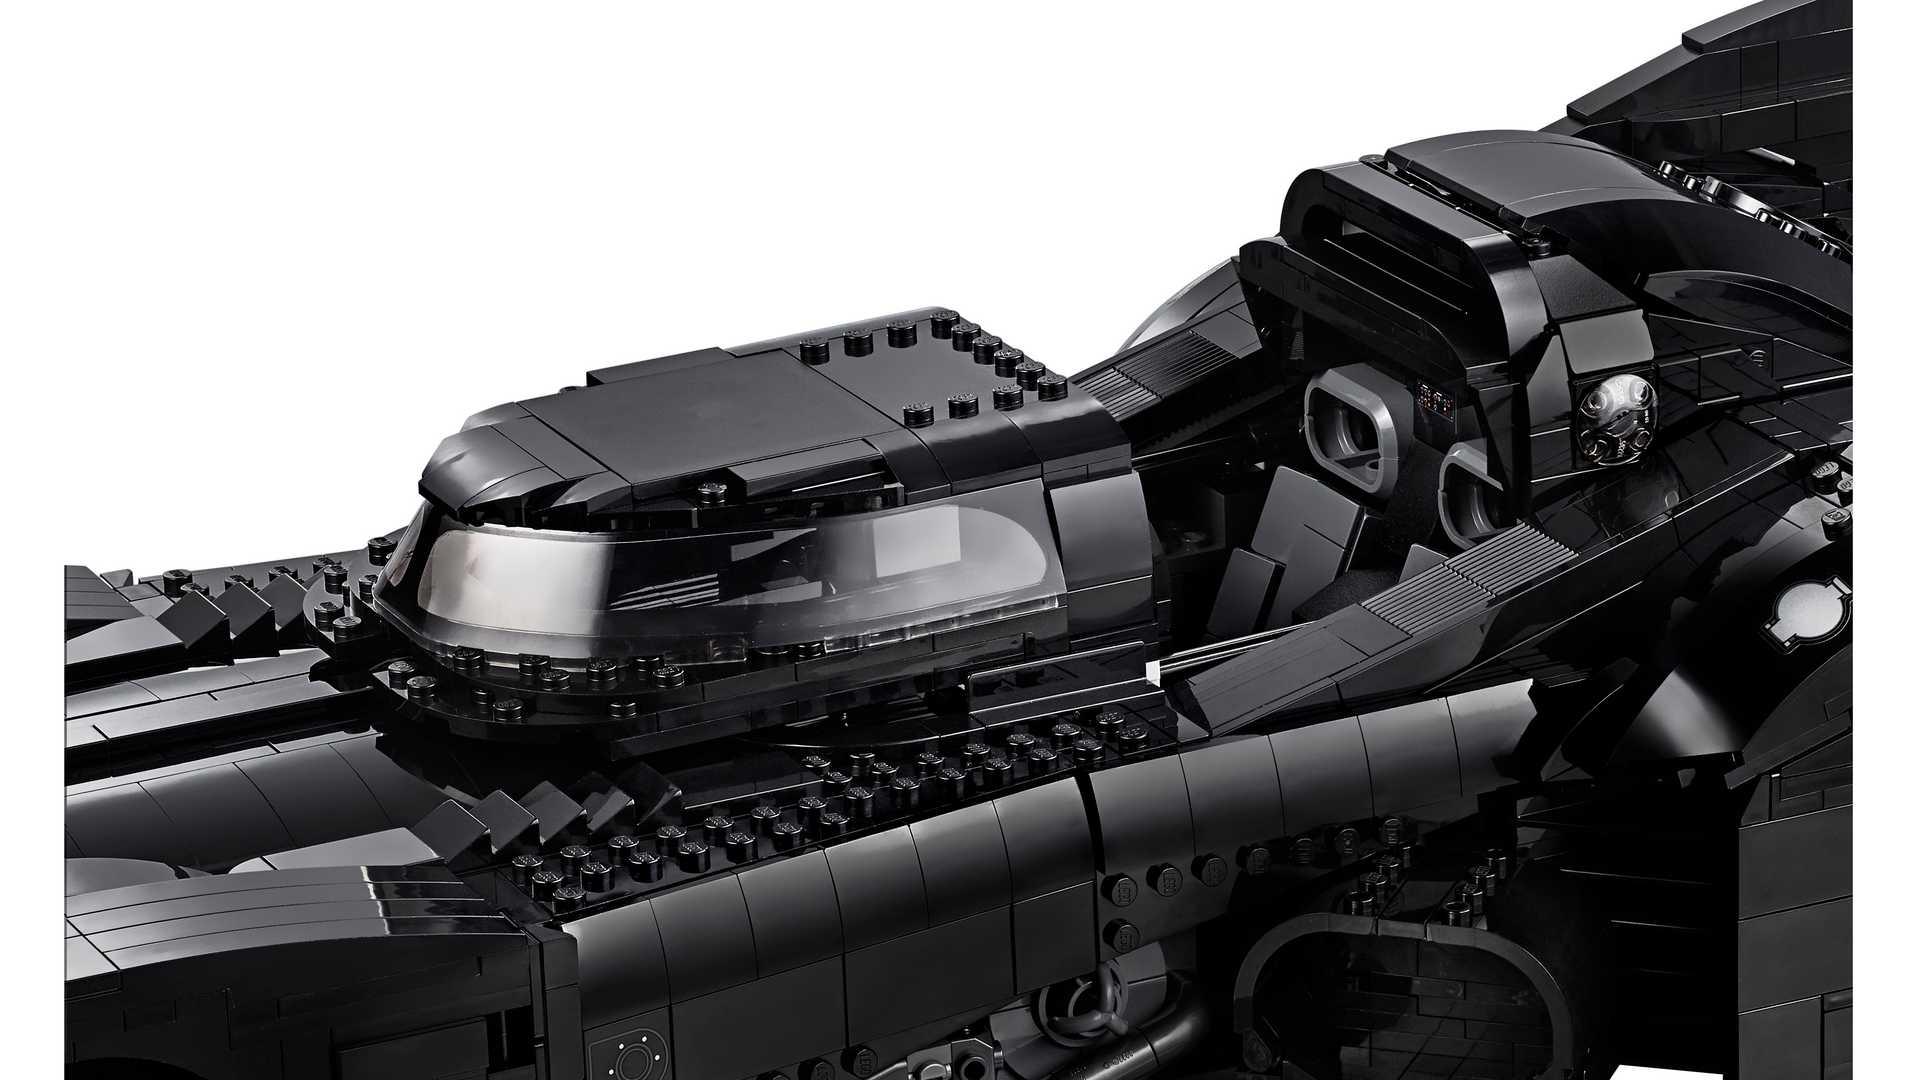 Lego-Batmobile-kit-1989-24